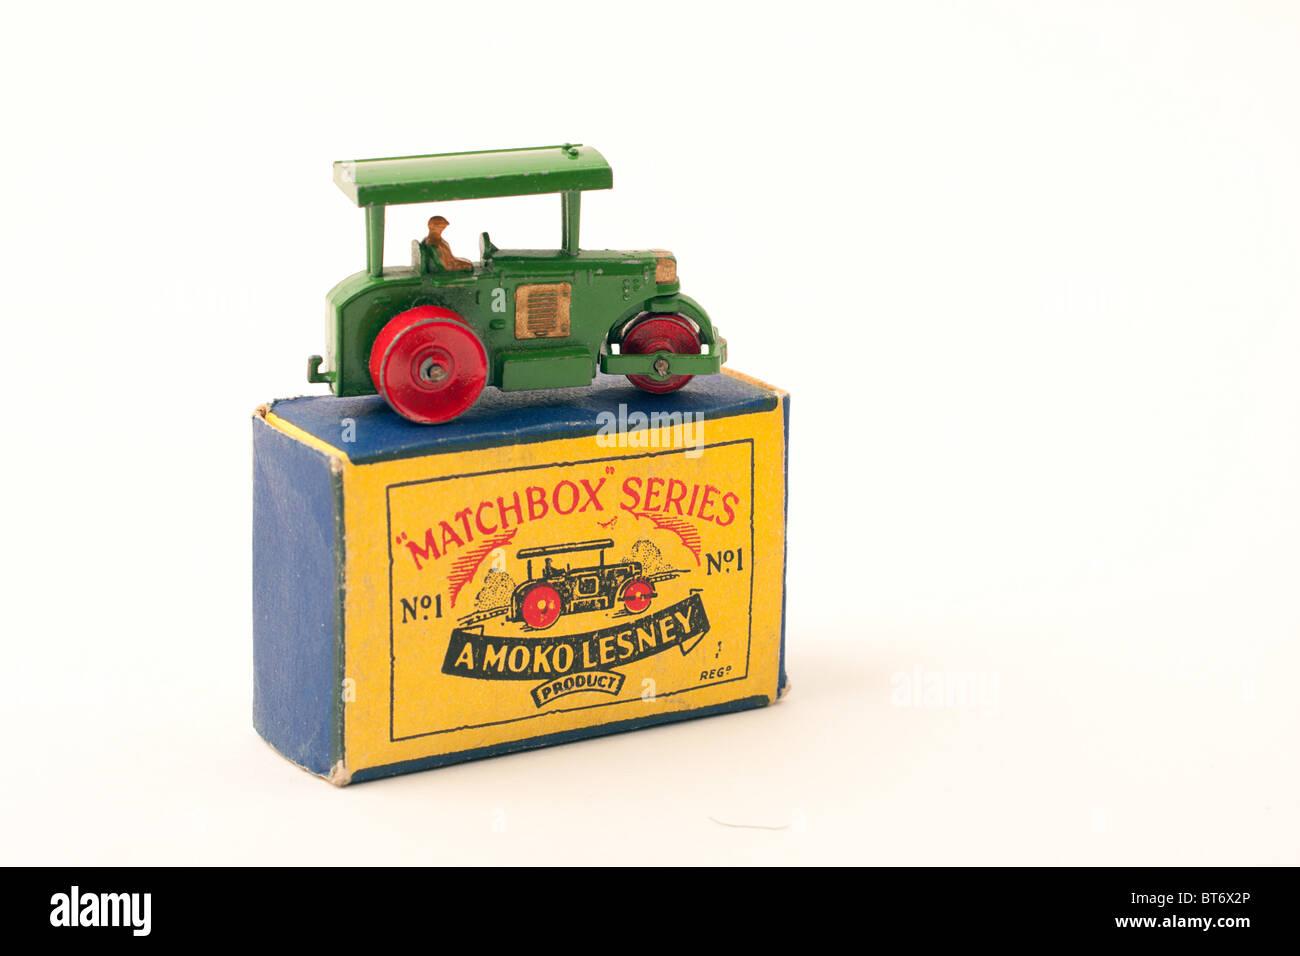 matchbox 1-75 die cast car, mint in box - Stock Image